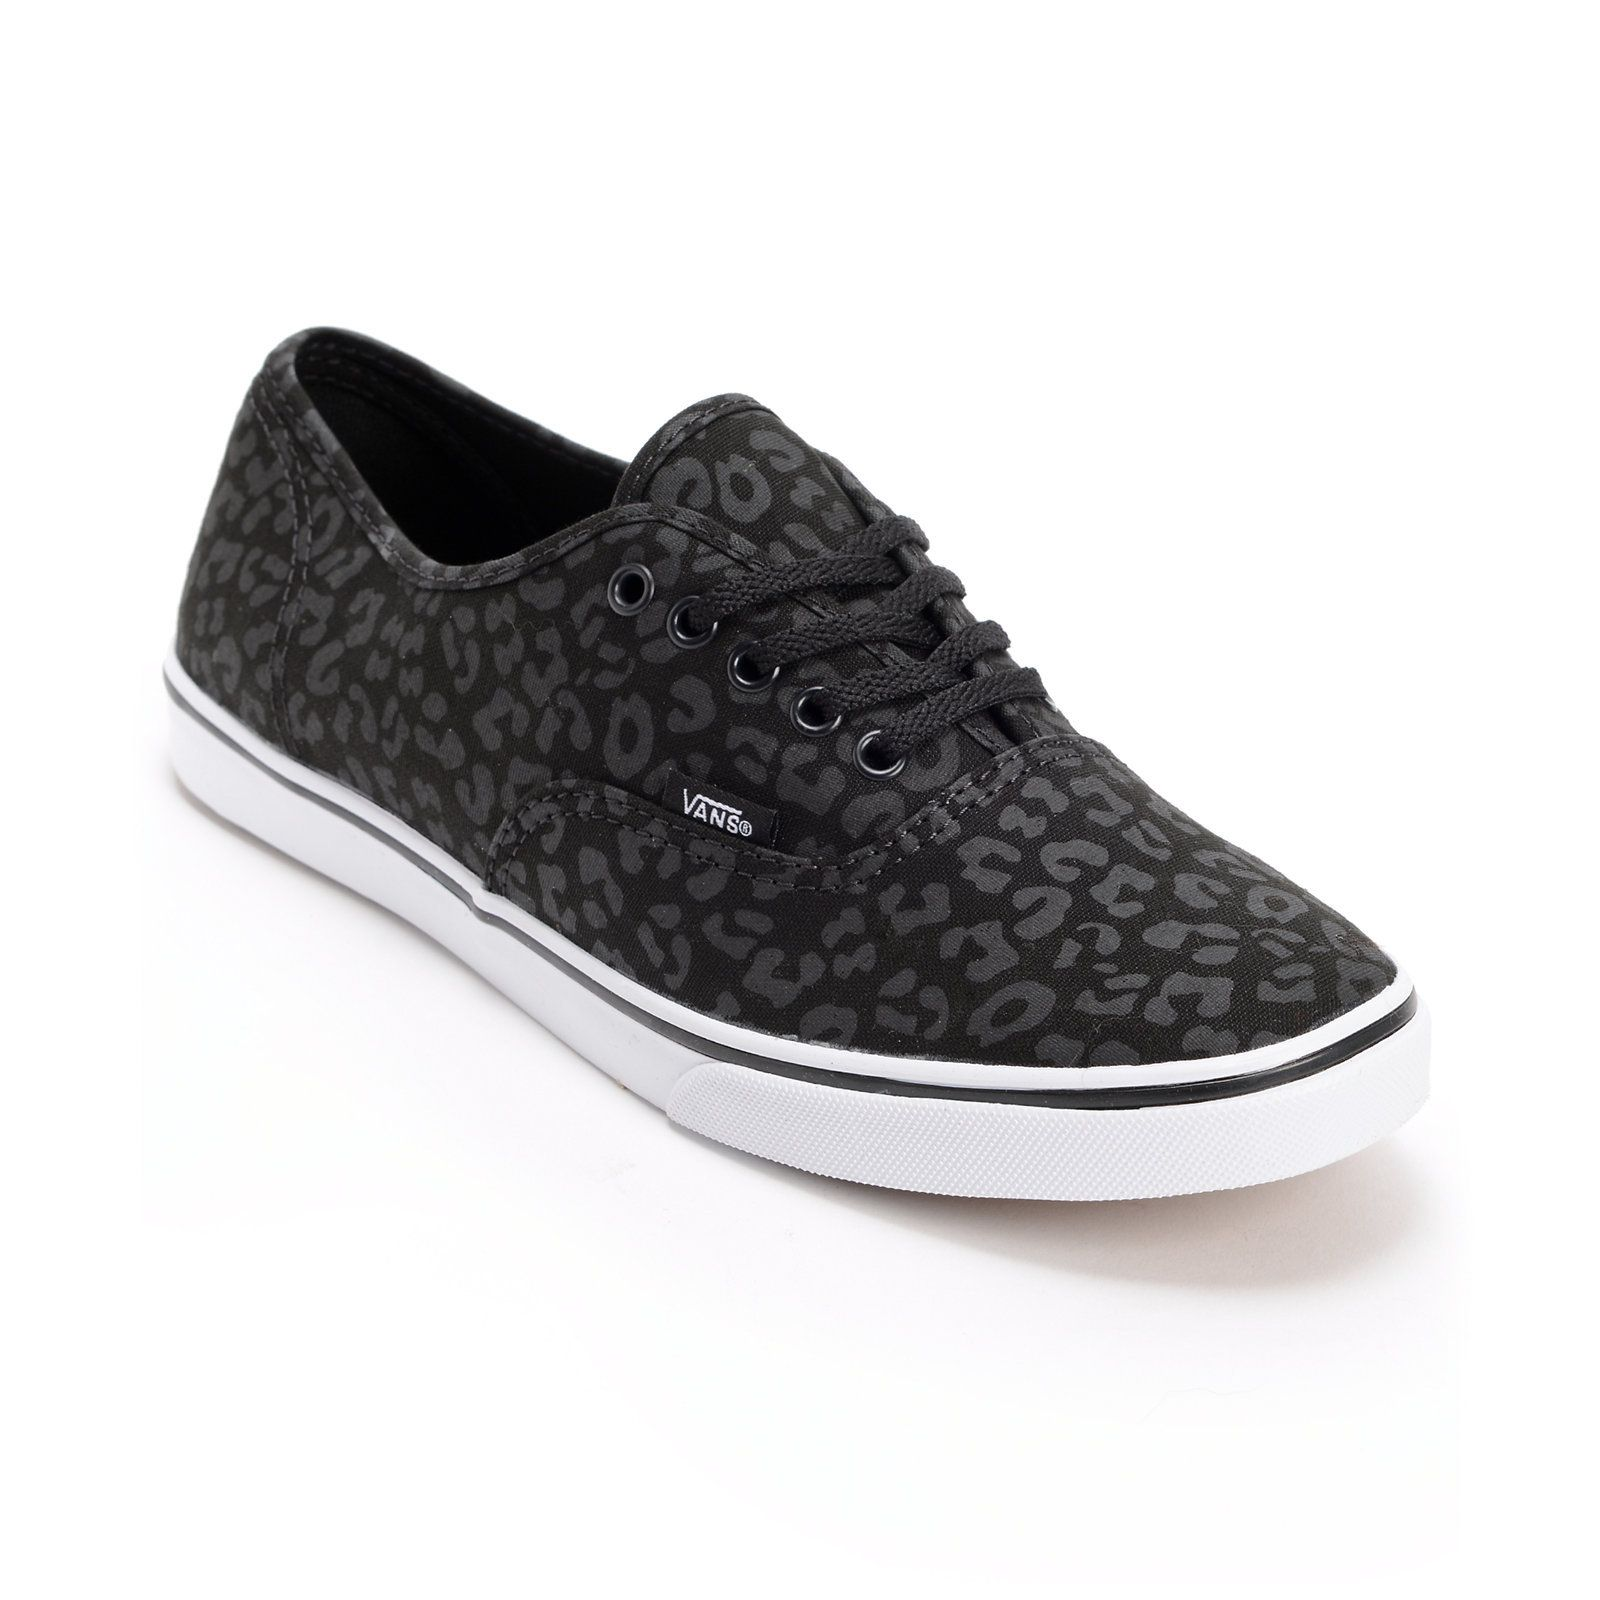 vans printed casual shoes